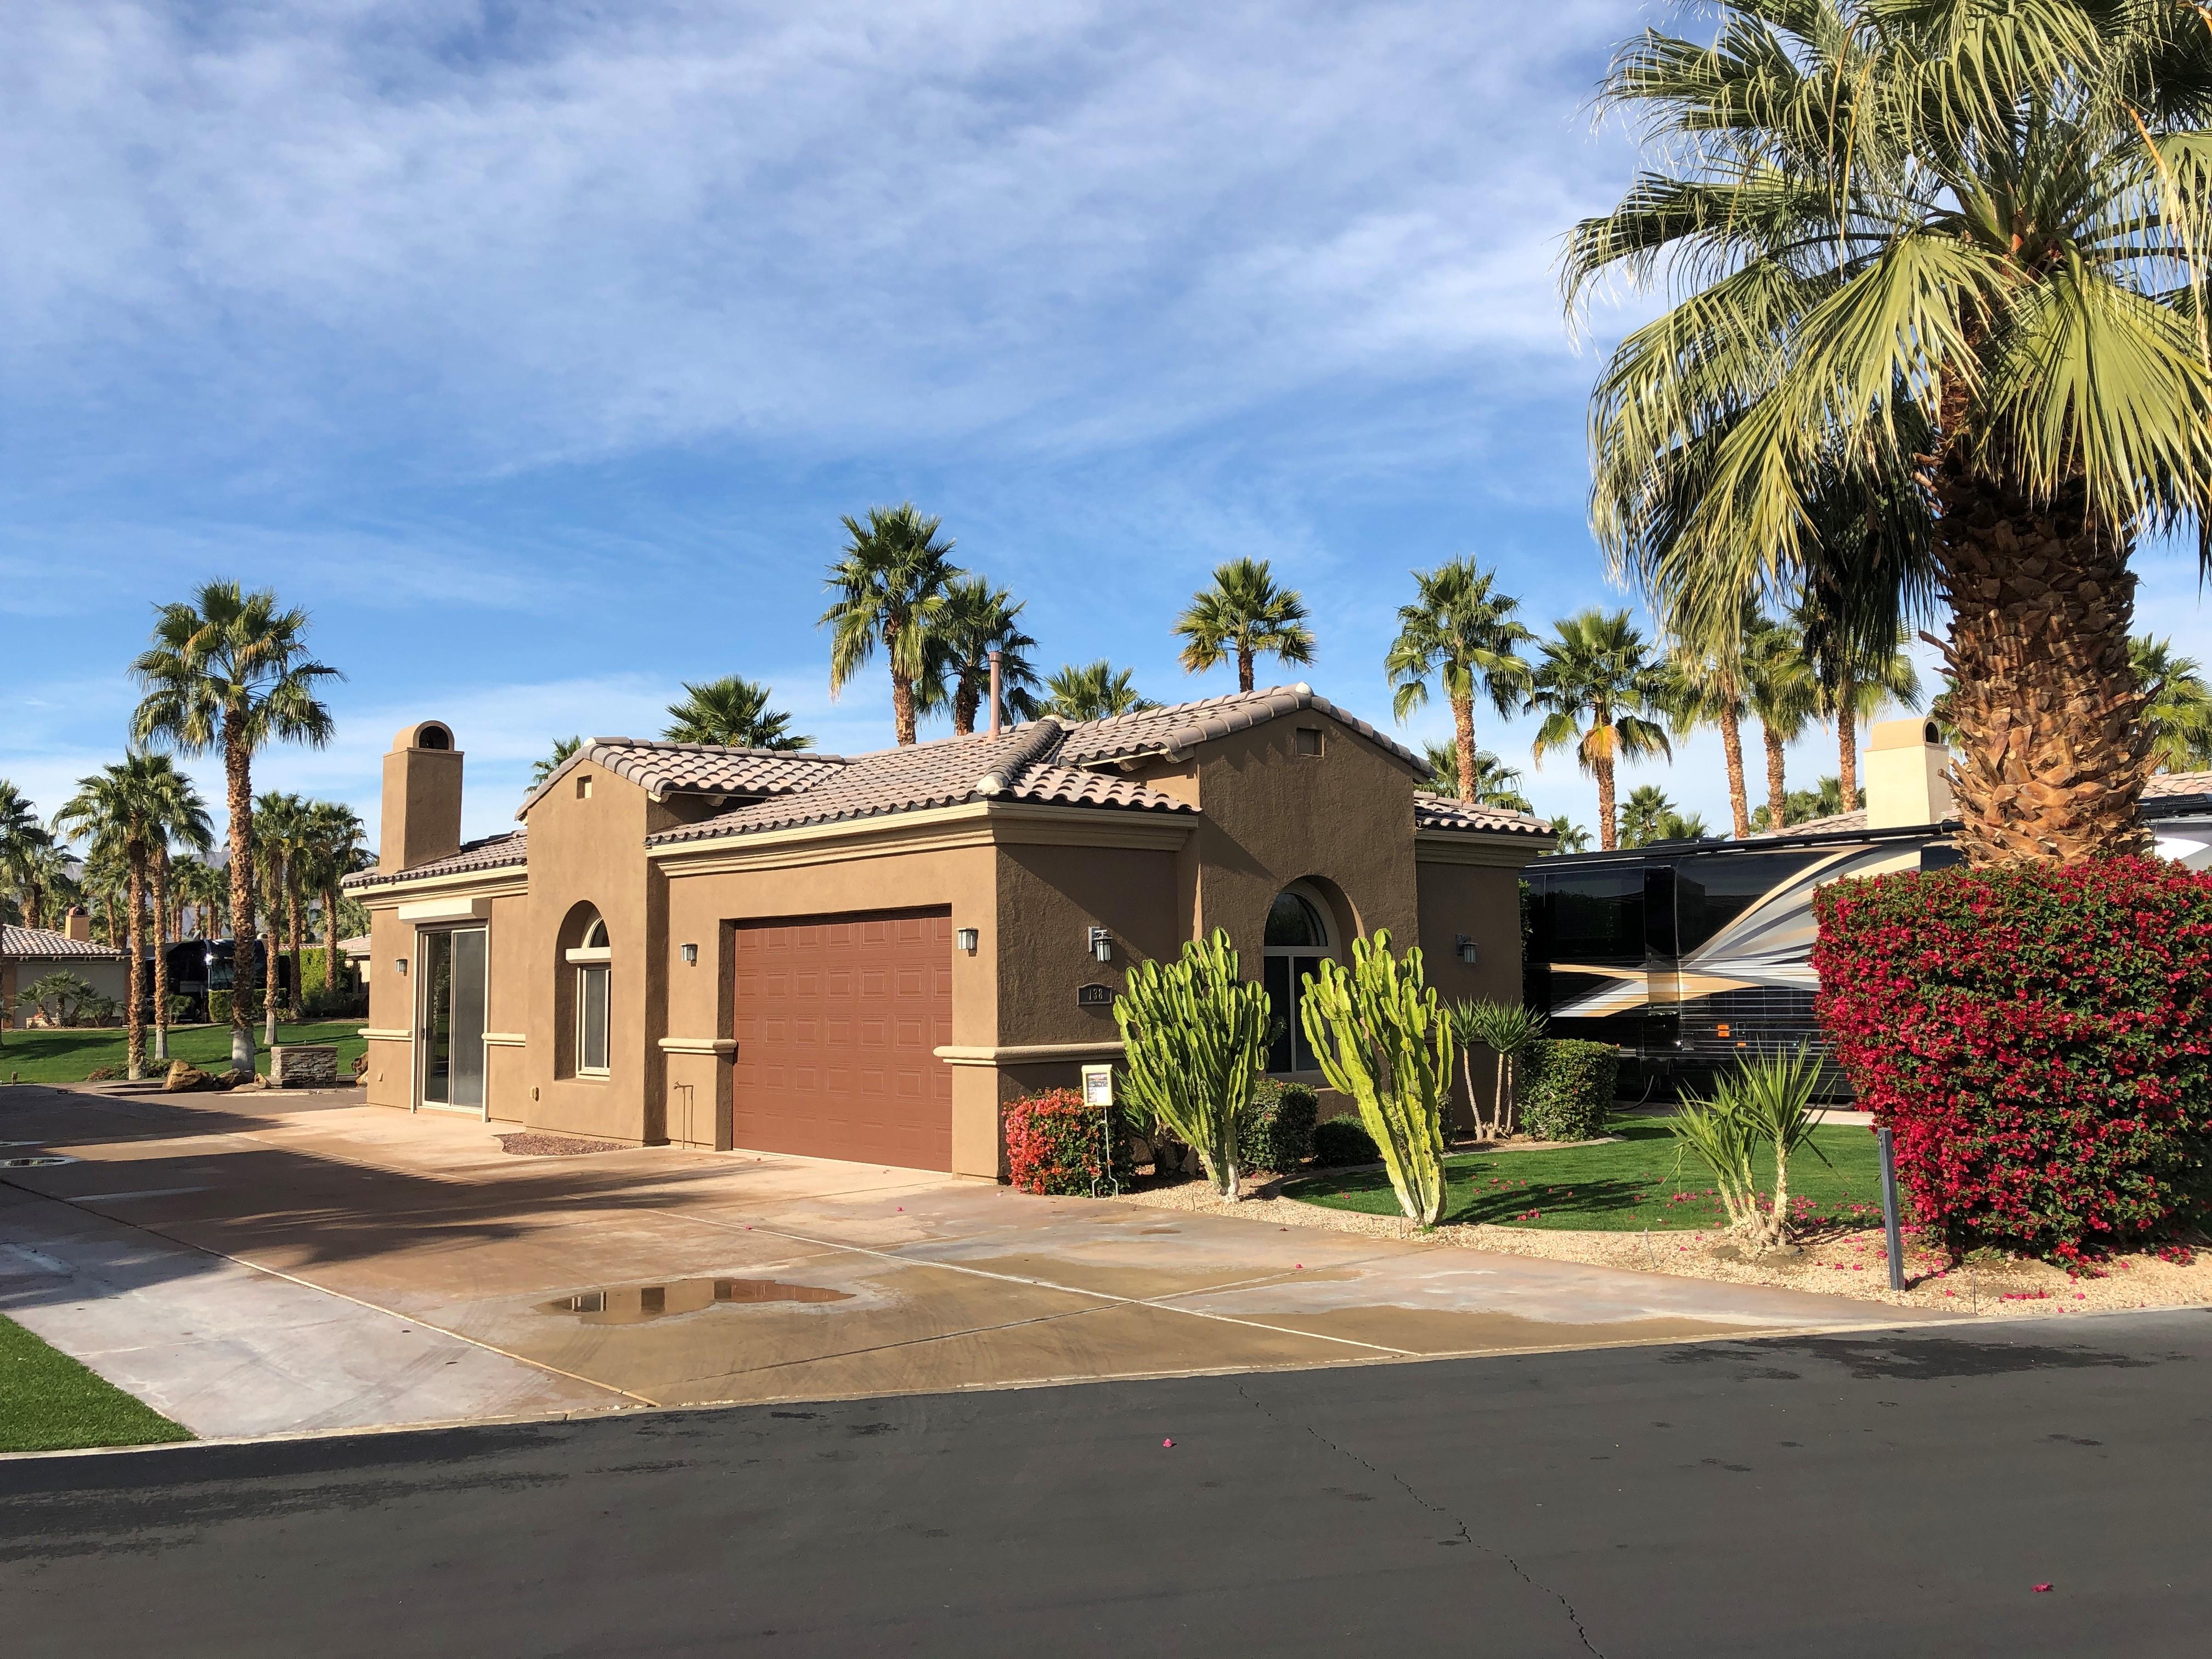 Lot 138 For Lease | Luxury RV Park | Indio, CA | Desert